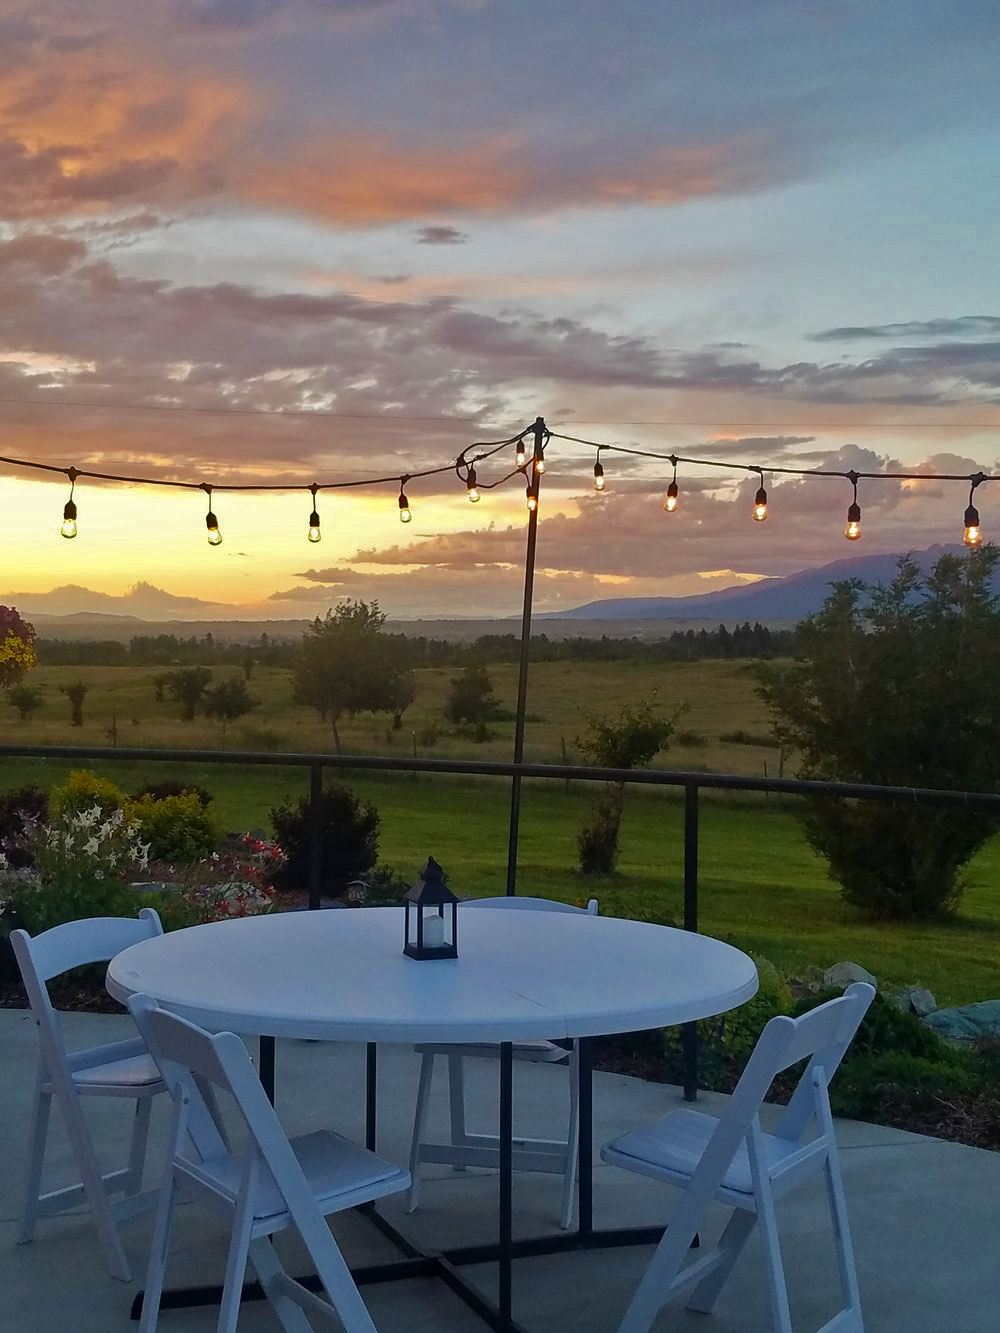 Sunset at Rugged Horizon